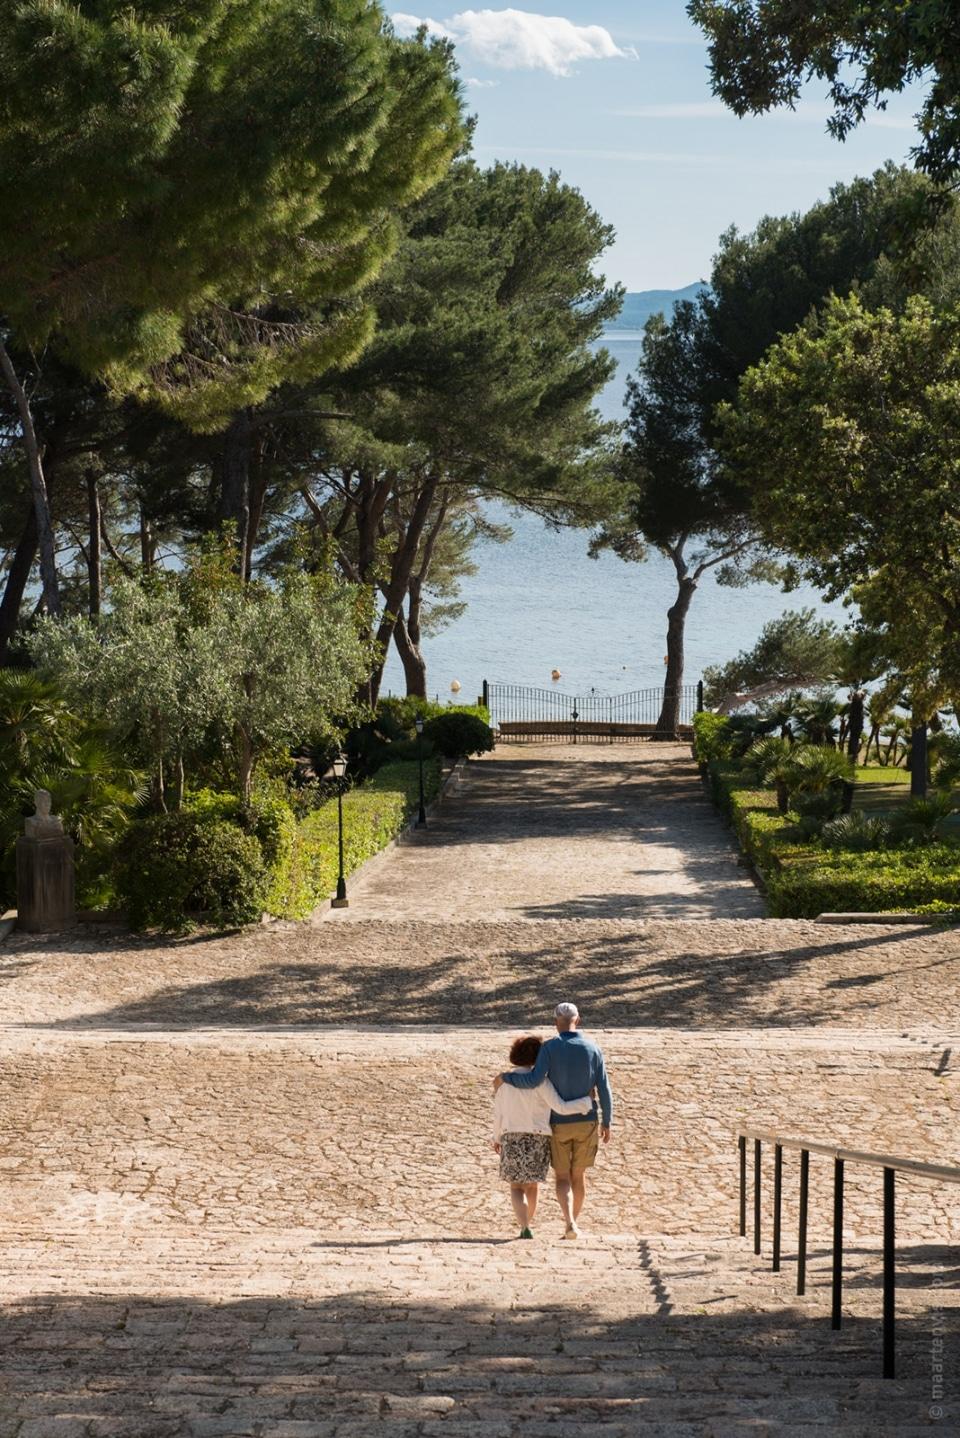 20140429 9537 960x1438 - Hotel Formentor in Spring